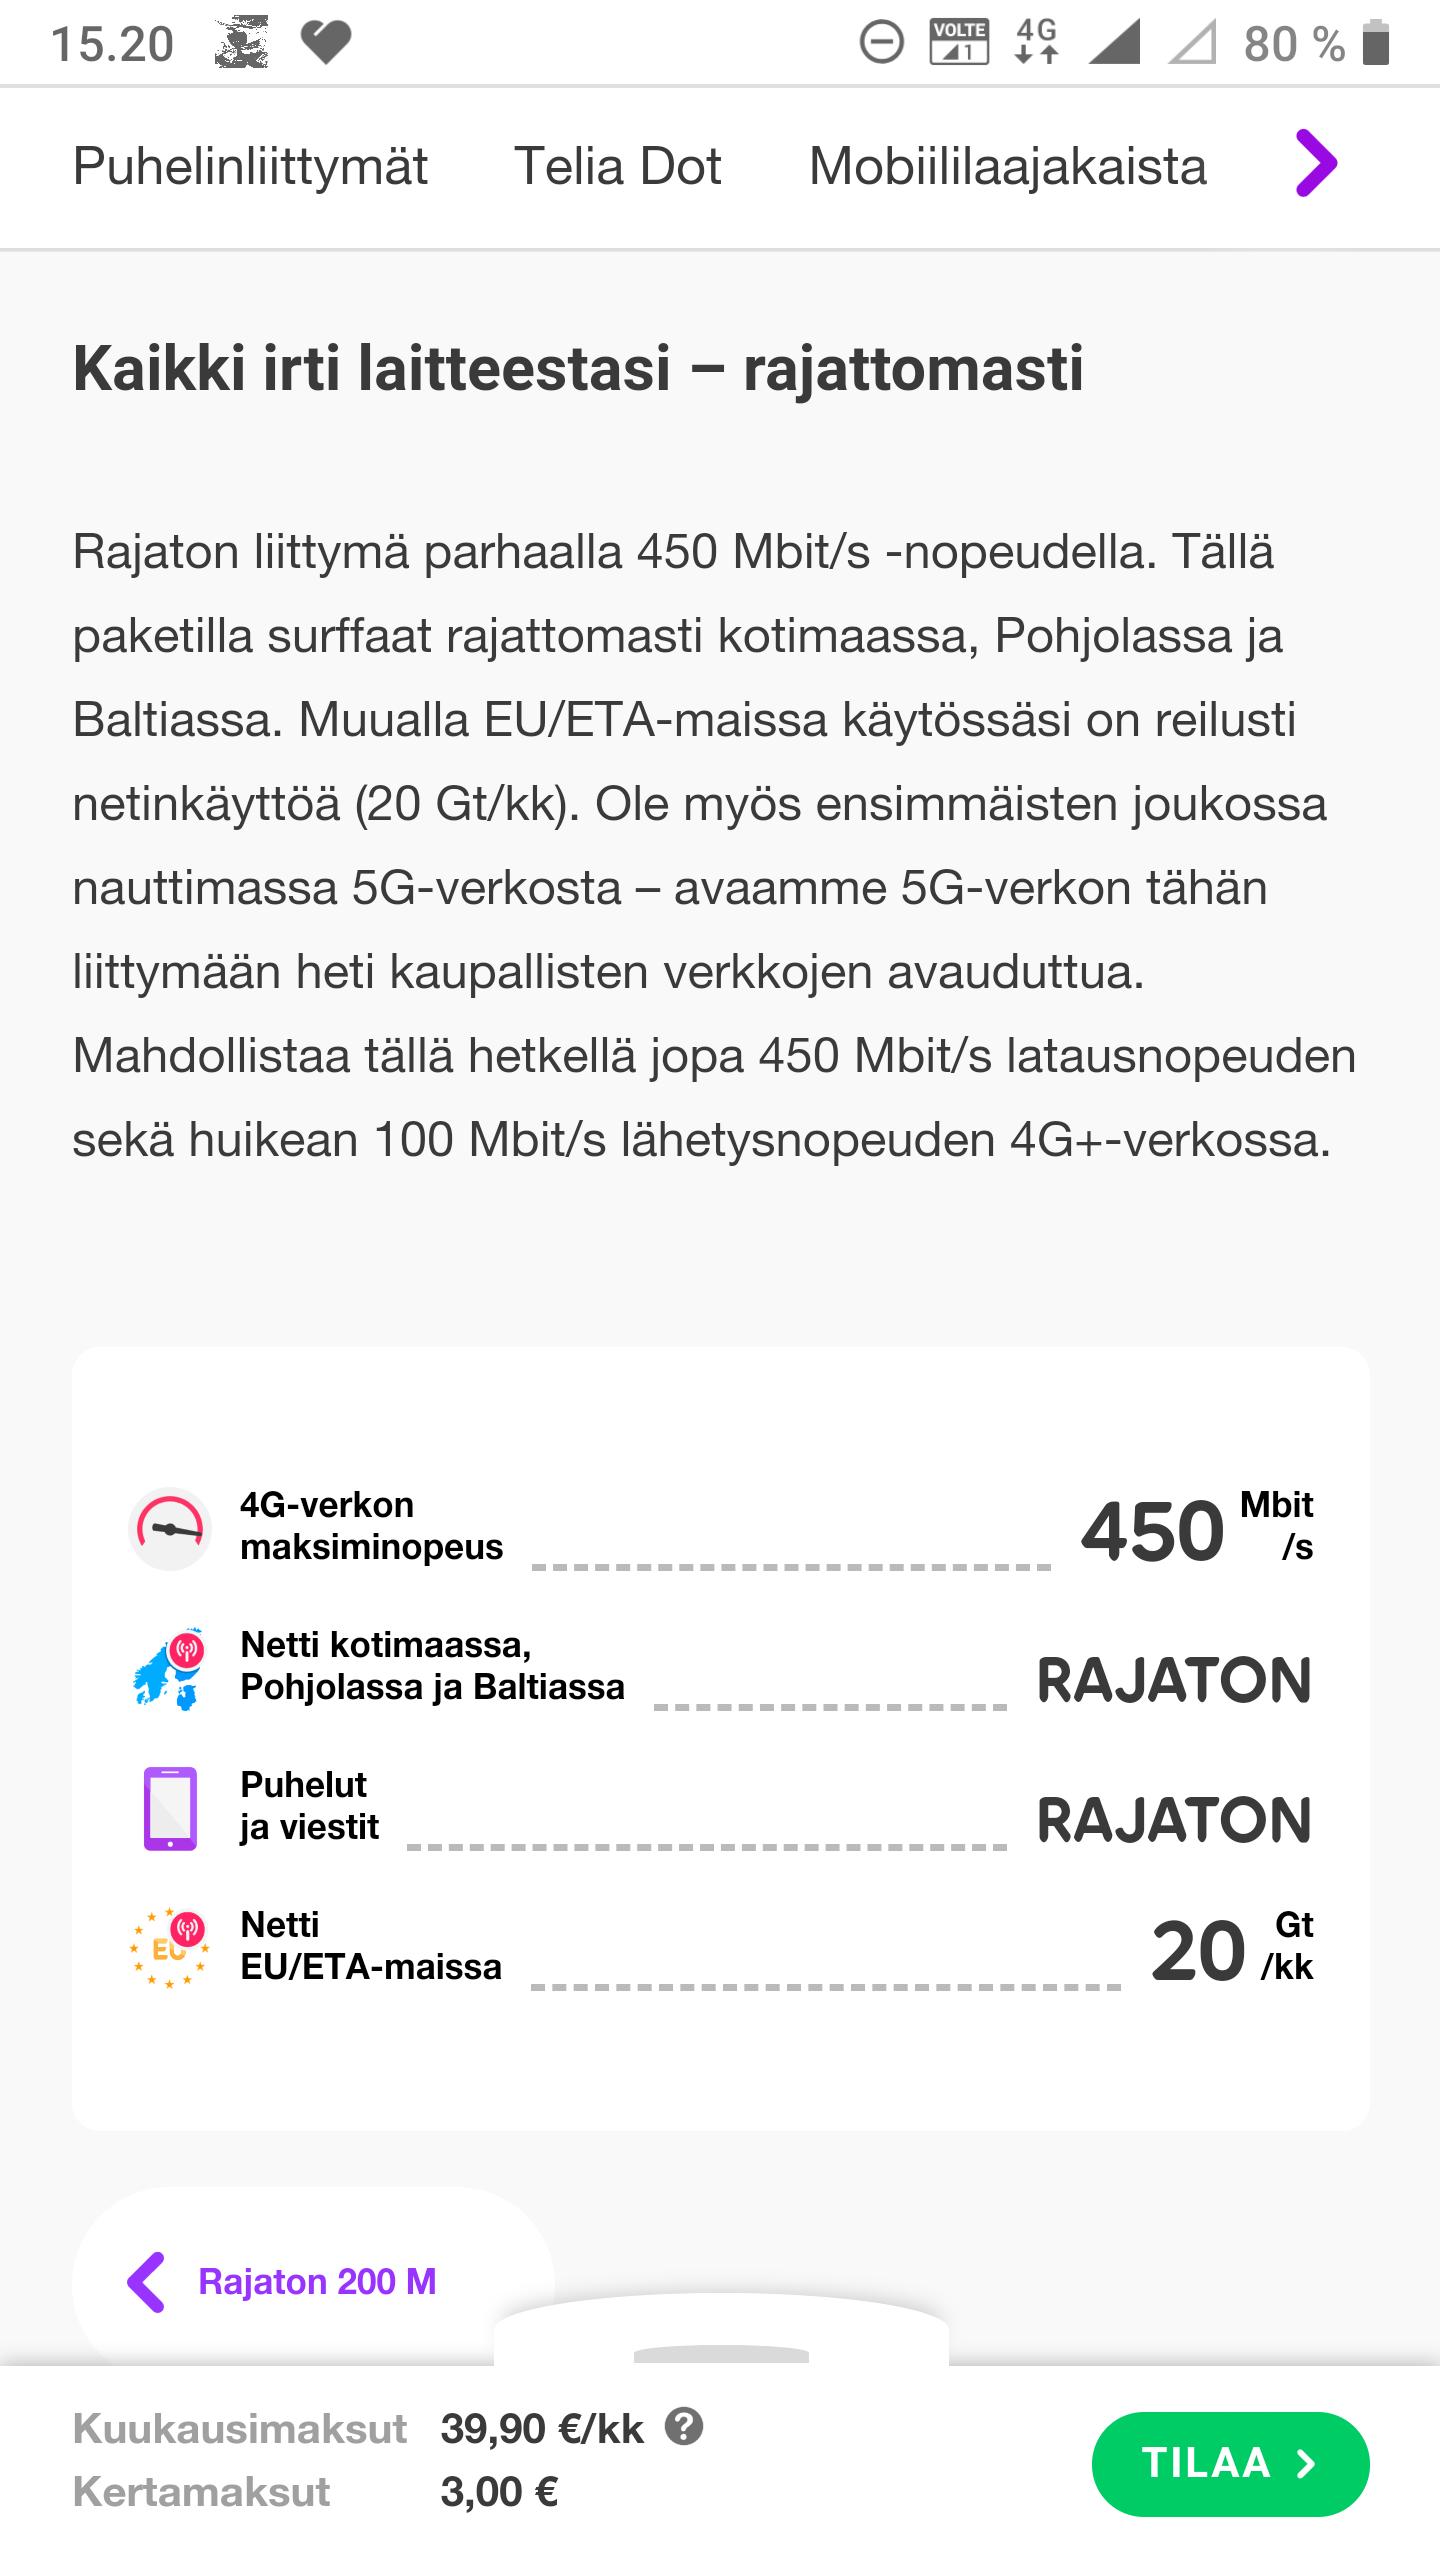 Screenshot_20190430-152051.png